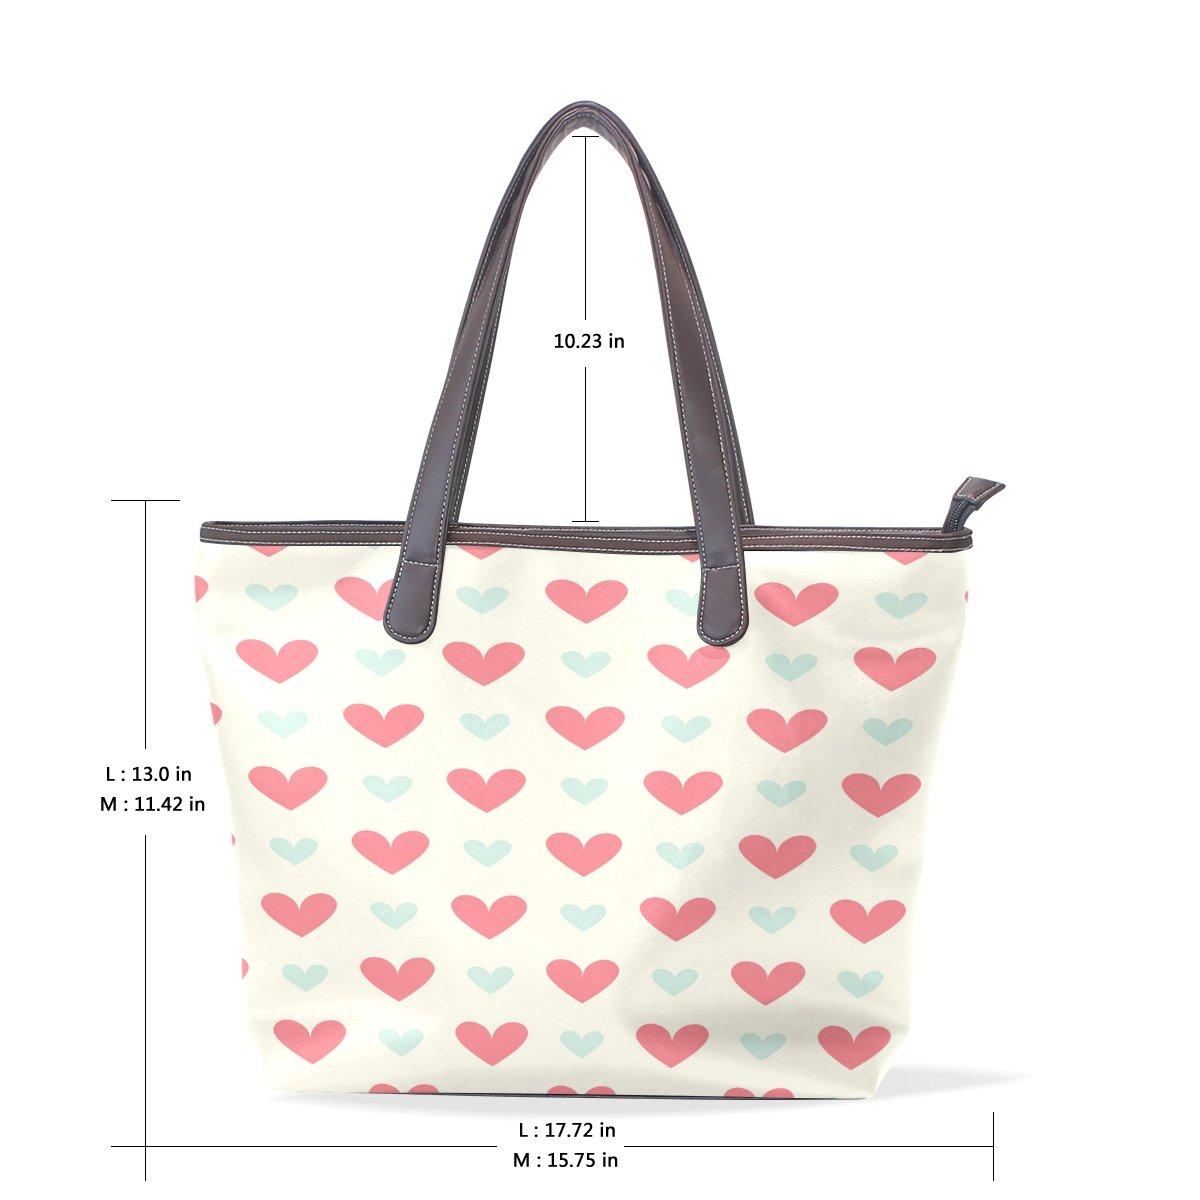 Ye Store Red And Blue Heart Pattern Lady PU Leather Handbag Tote Bag Shoulder Bag Shopping Bag